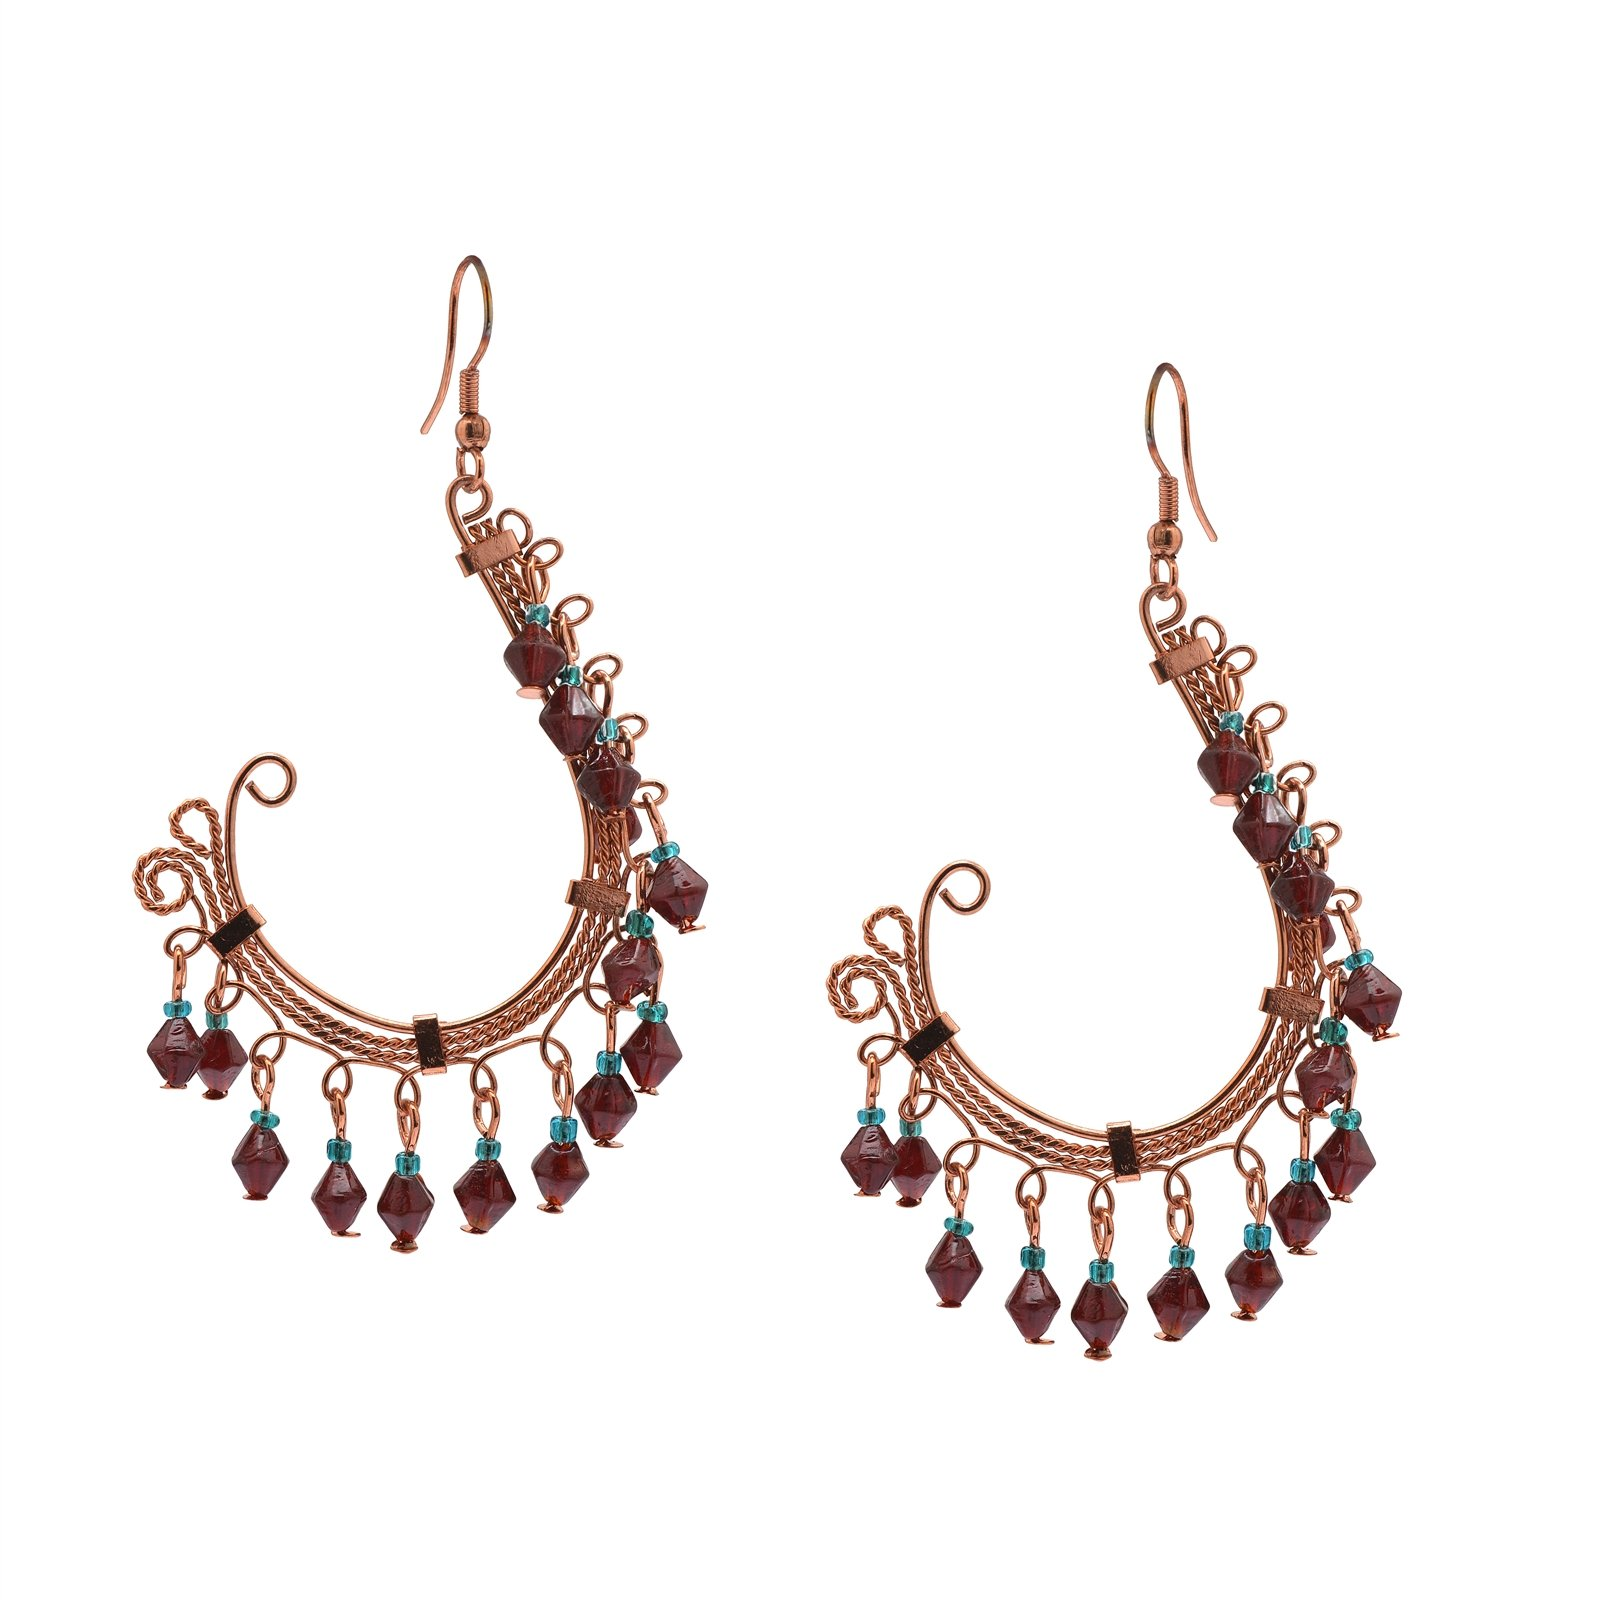 Zephyrr Fashion Jewellery Copper Earrings Red Glass Beaded Contemporary Dangle & Drop by Zephyrr